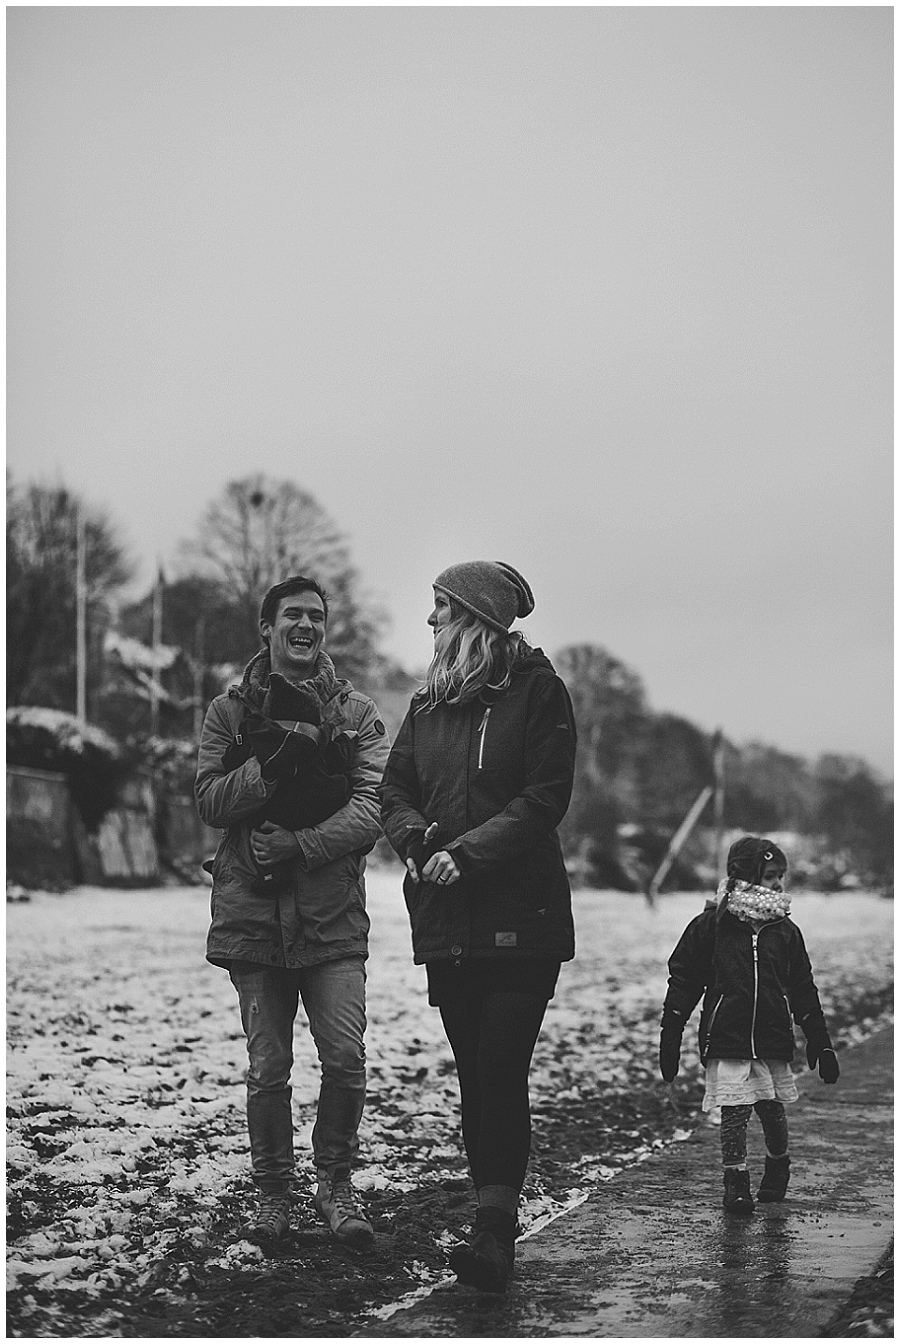 schneezauber-am-elbufer-familienfotografie-daniel-zube_0053.jpg